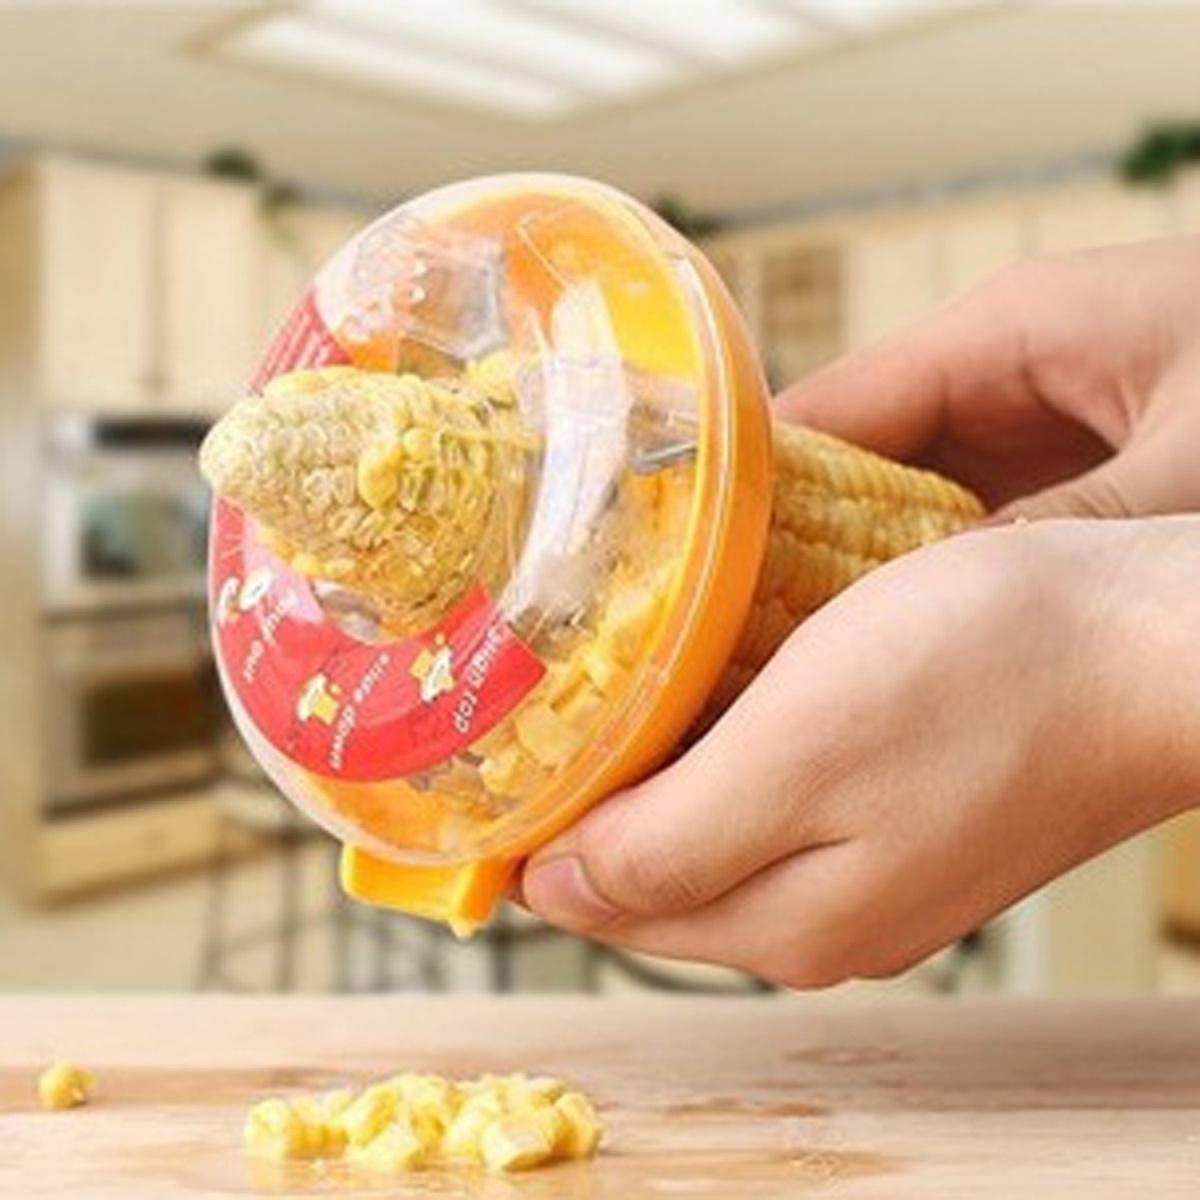 Как очищают семечки от шелухи, чистим семечки быстро - Wday 61